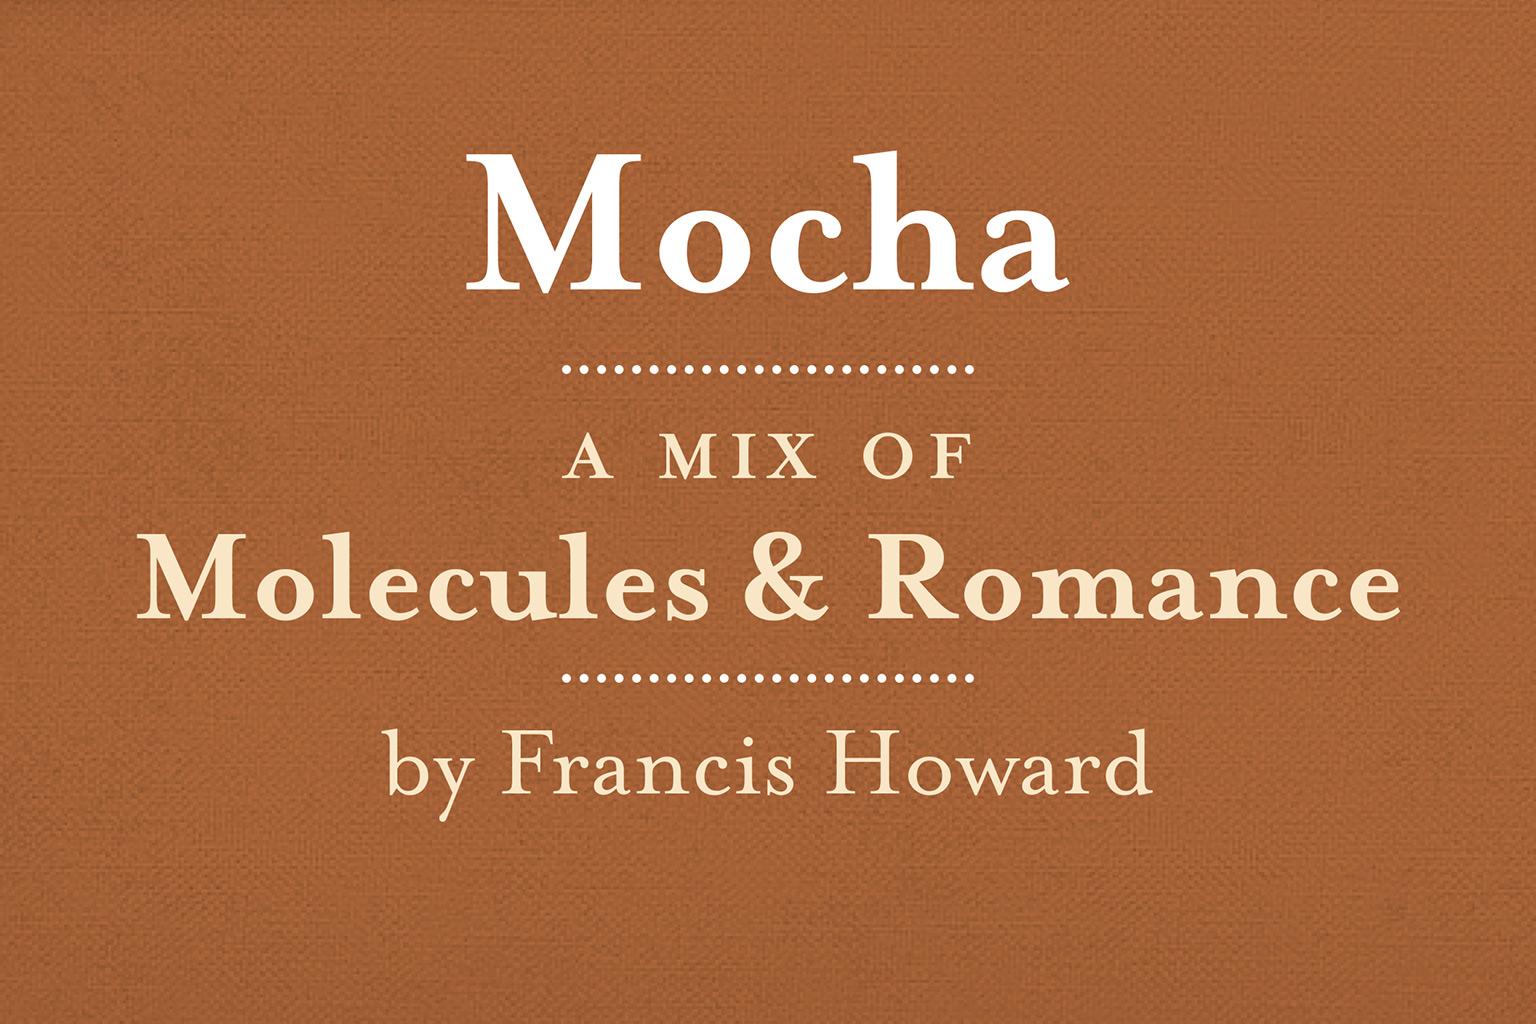 coffee magazine - mocha - romance - spicy - ibarra